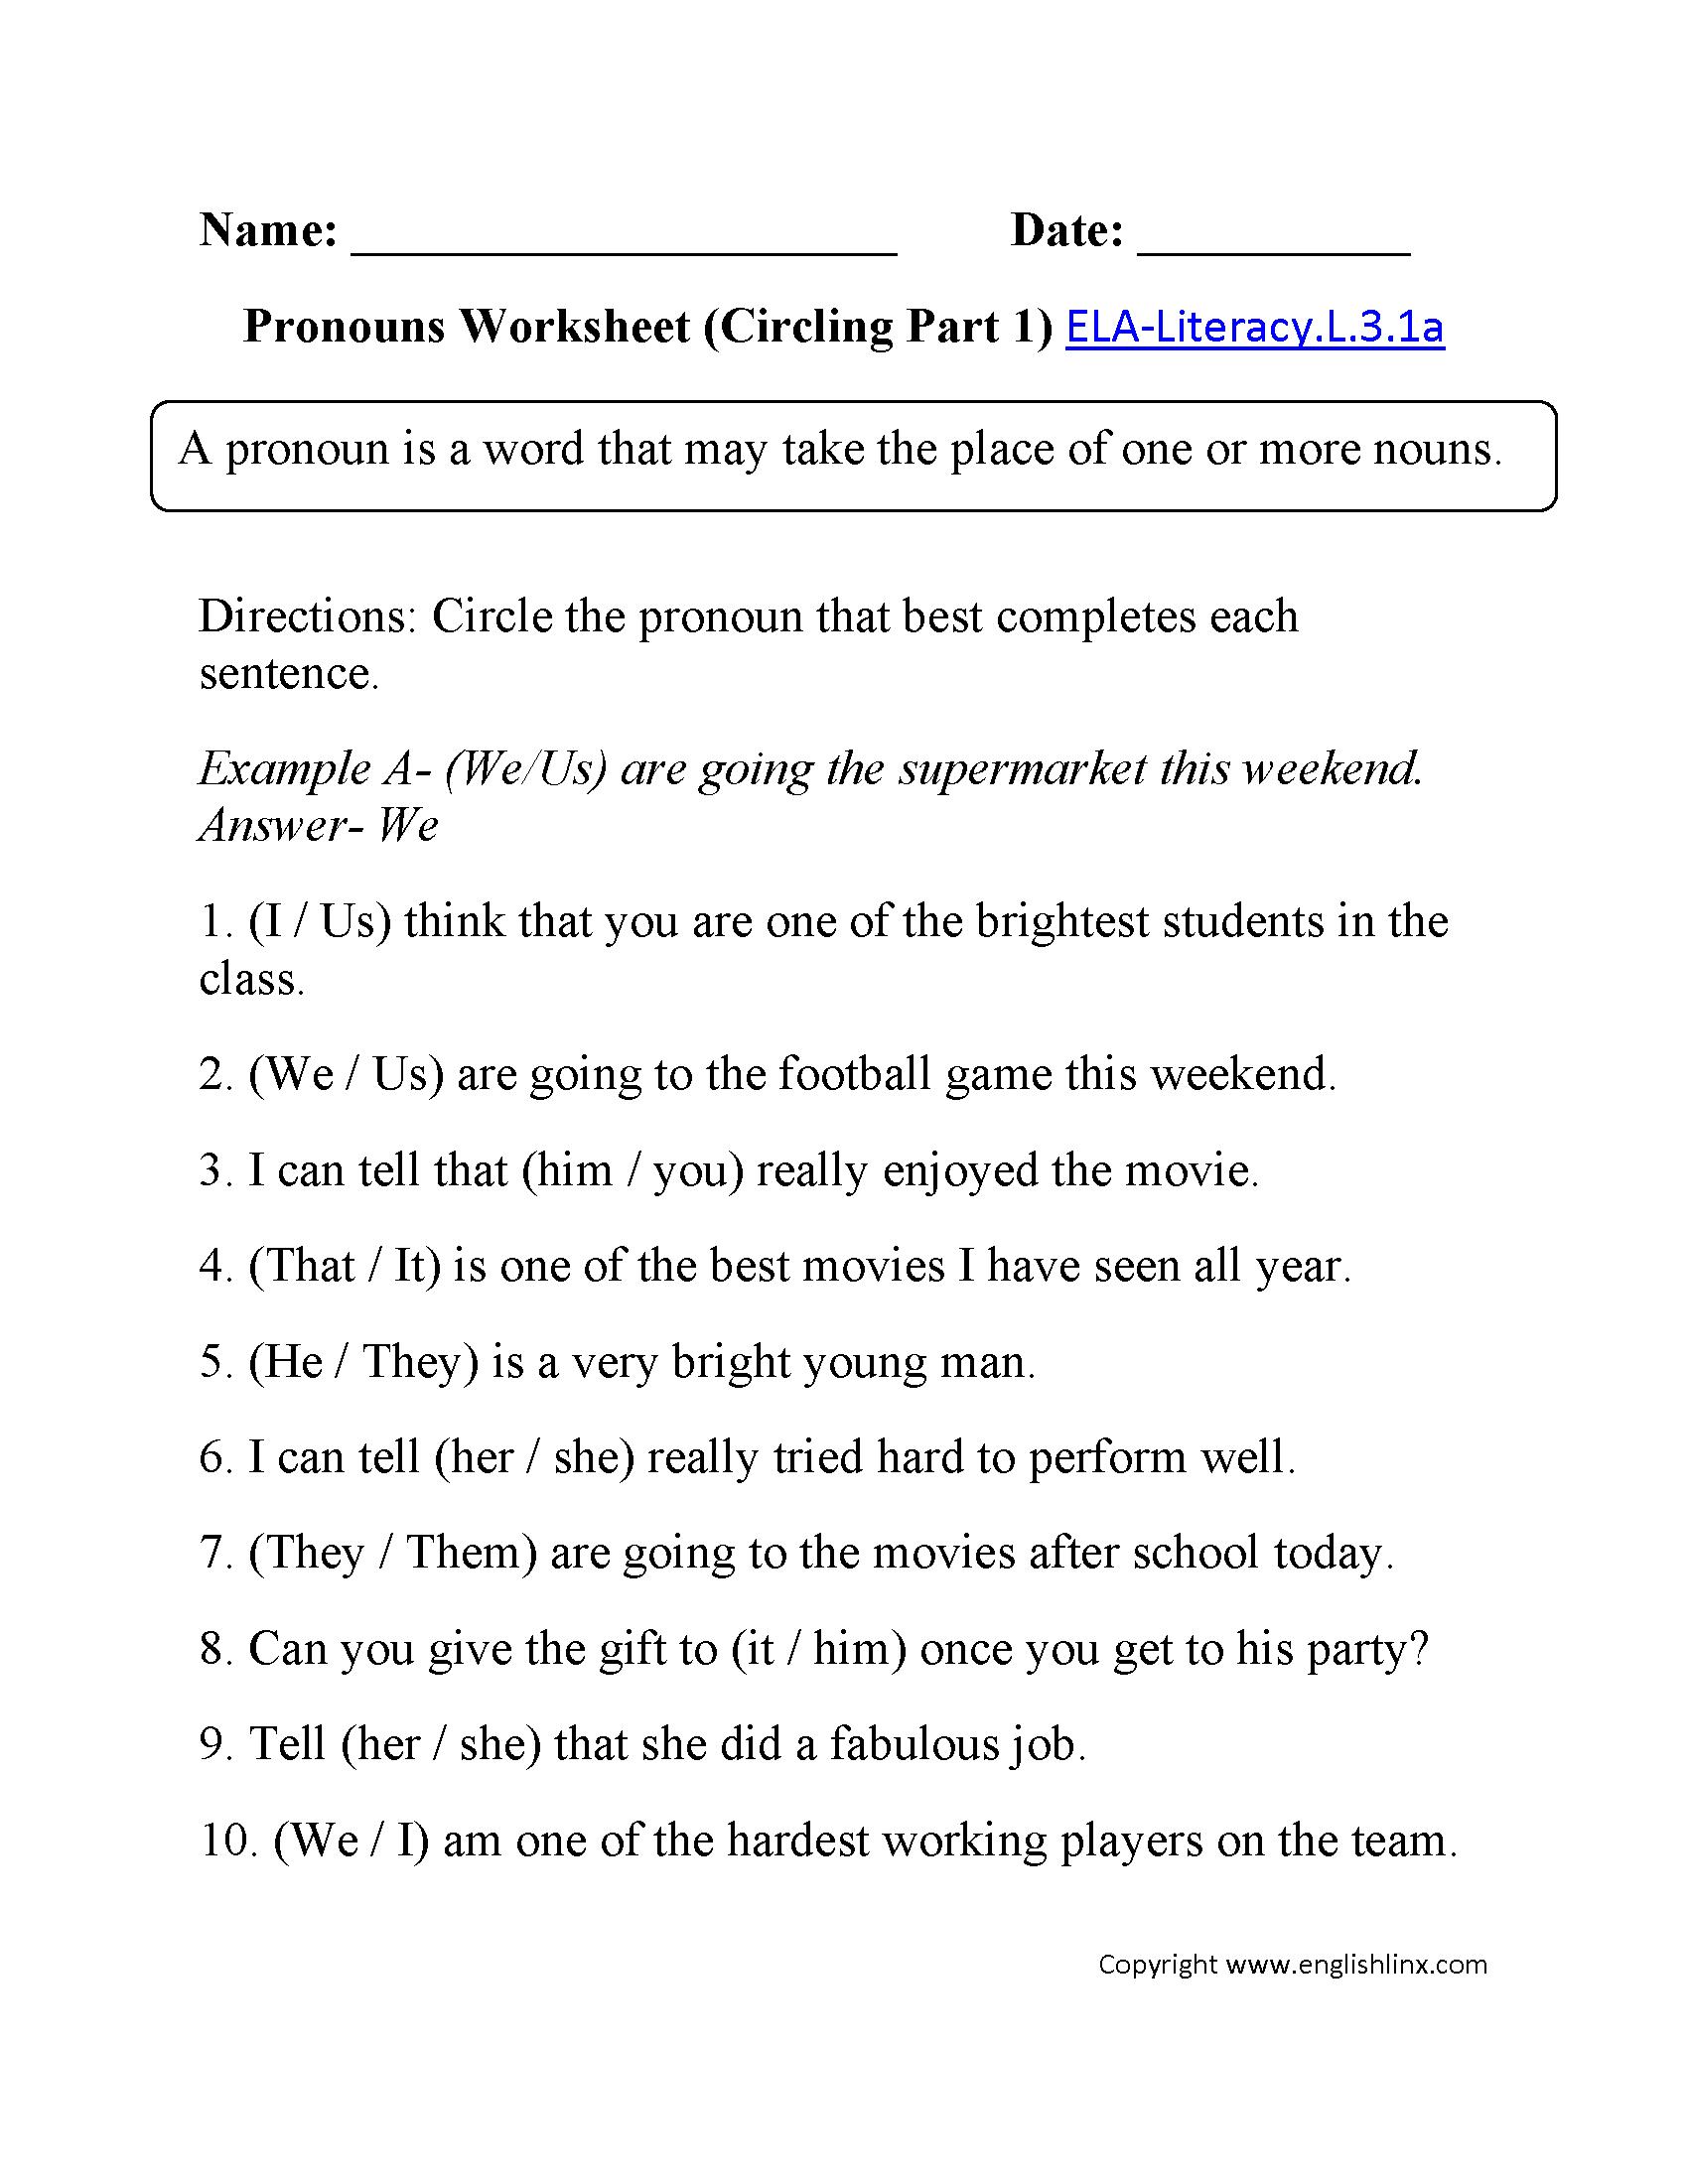 Worksheets Pronoun Verb Agreement Worksheet pronoun verb agreement worksheets free library download pr ouns l 3 1 p terest m c es w ksheets